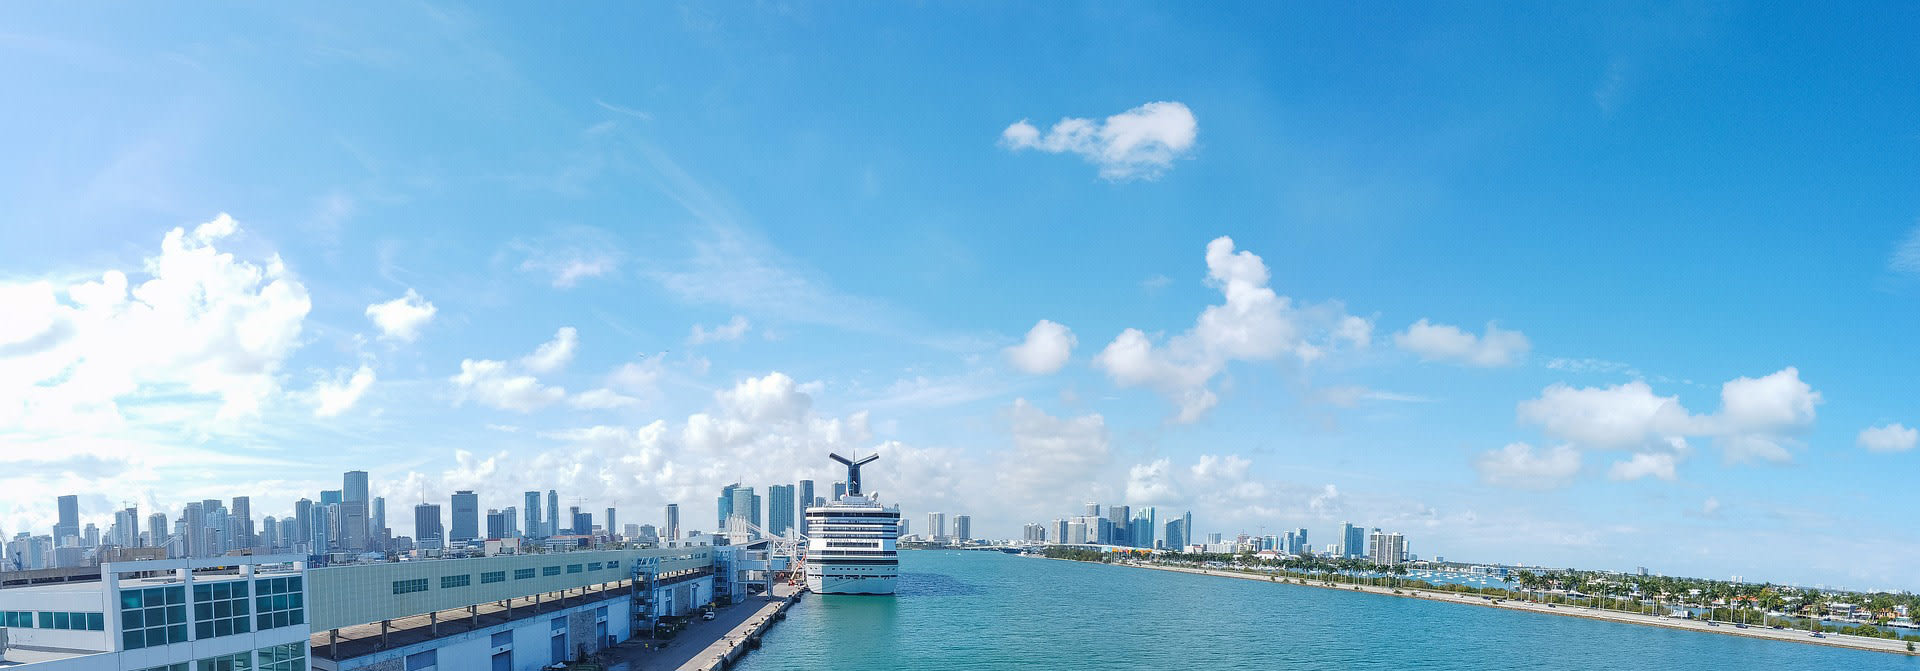 2021 Florida Cruises